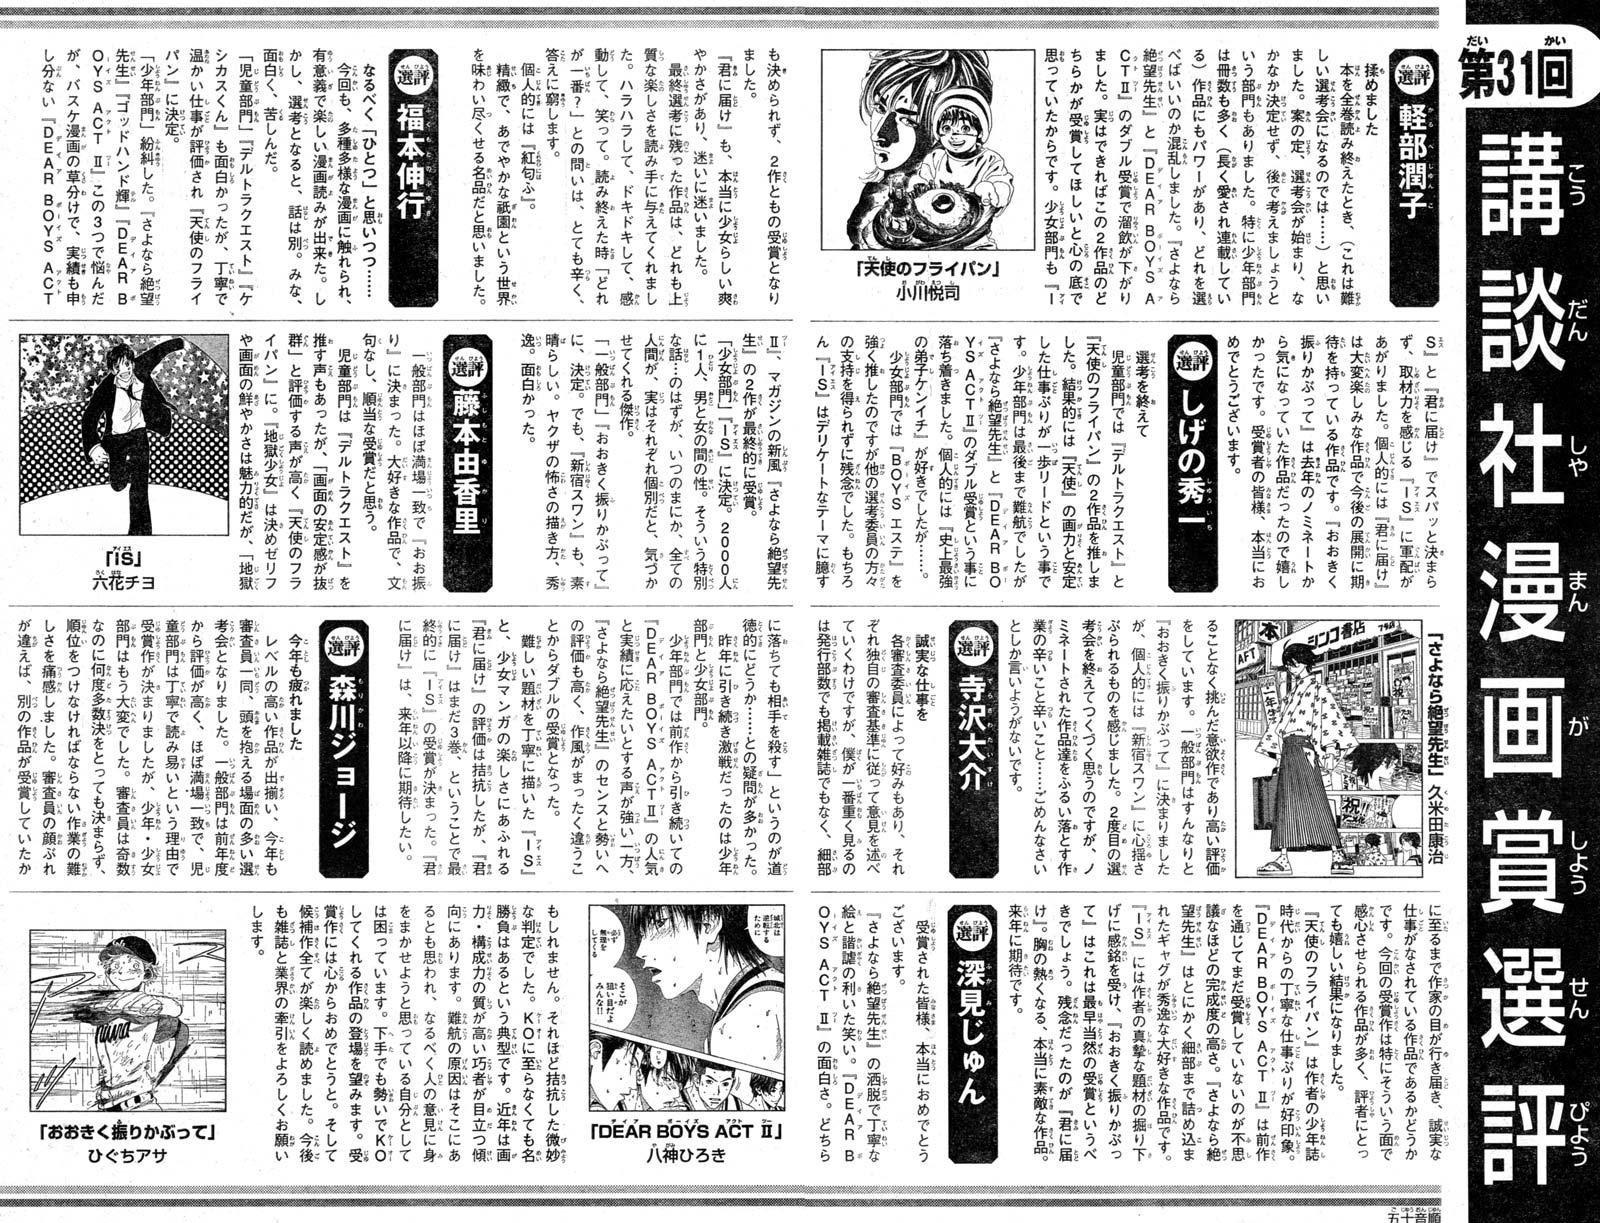 http://blog-imgs-11.fc2.com/k/a/m/kamesoku/20070607205941.jpg